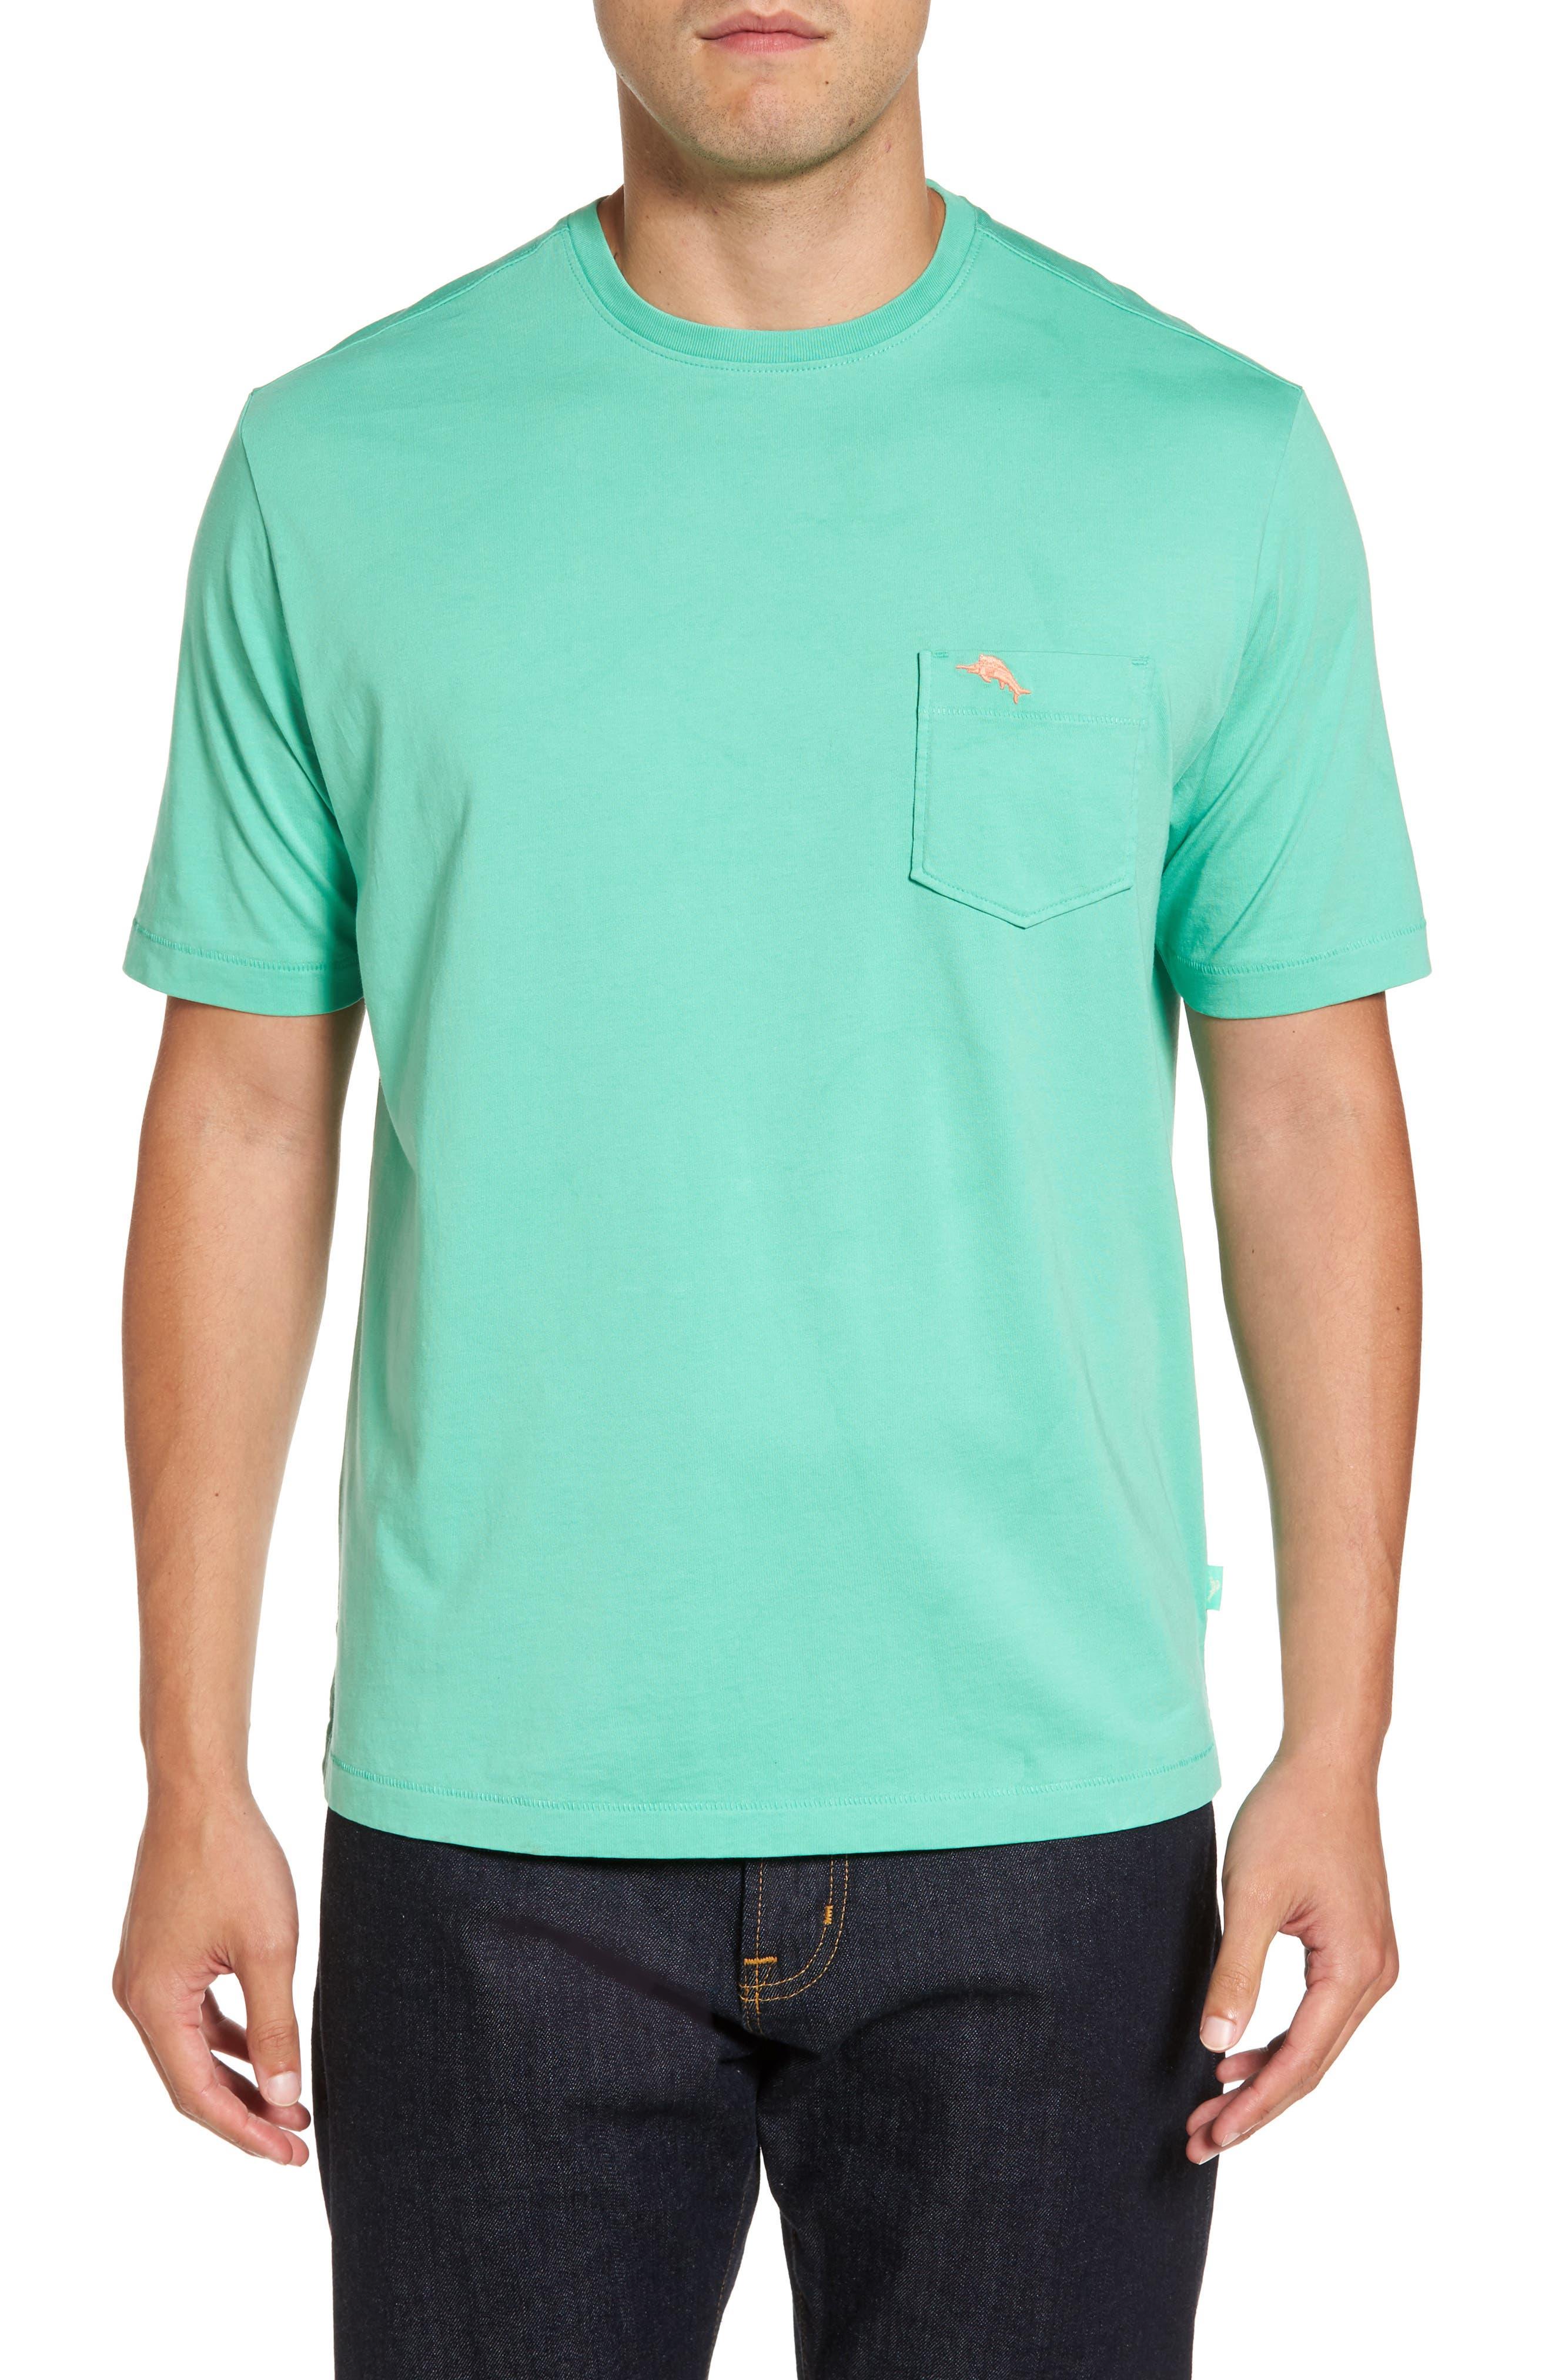 Bali Skyline Pocket T-Shirt,                             Main thumbnail 1, color,                             300